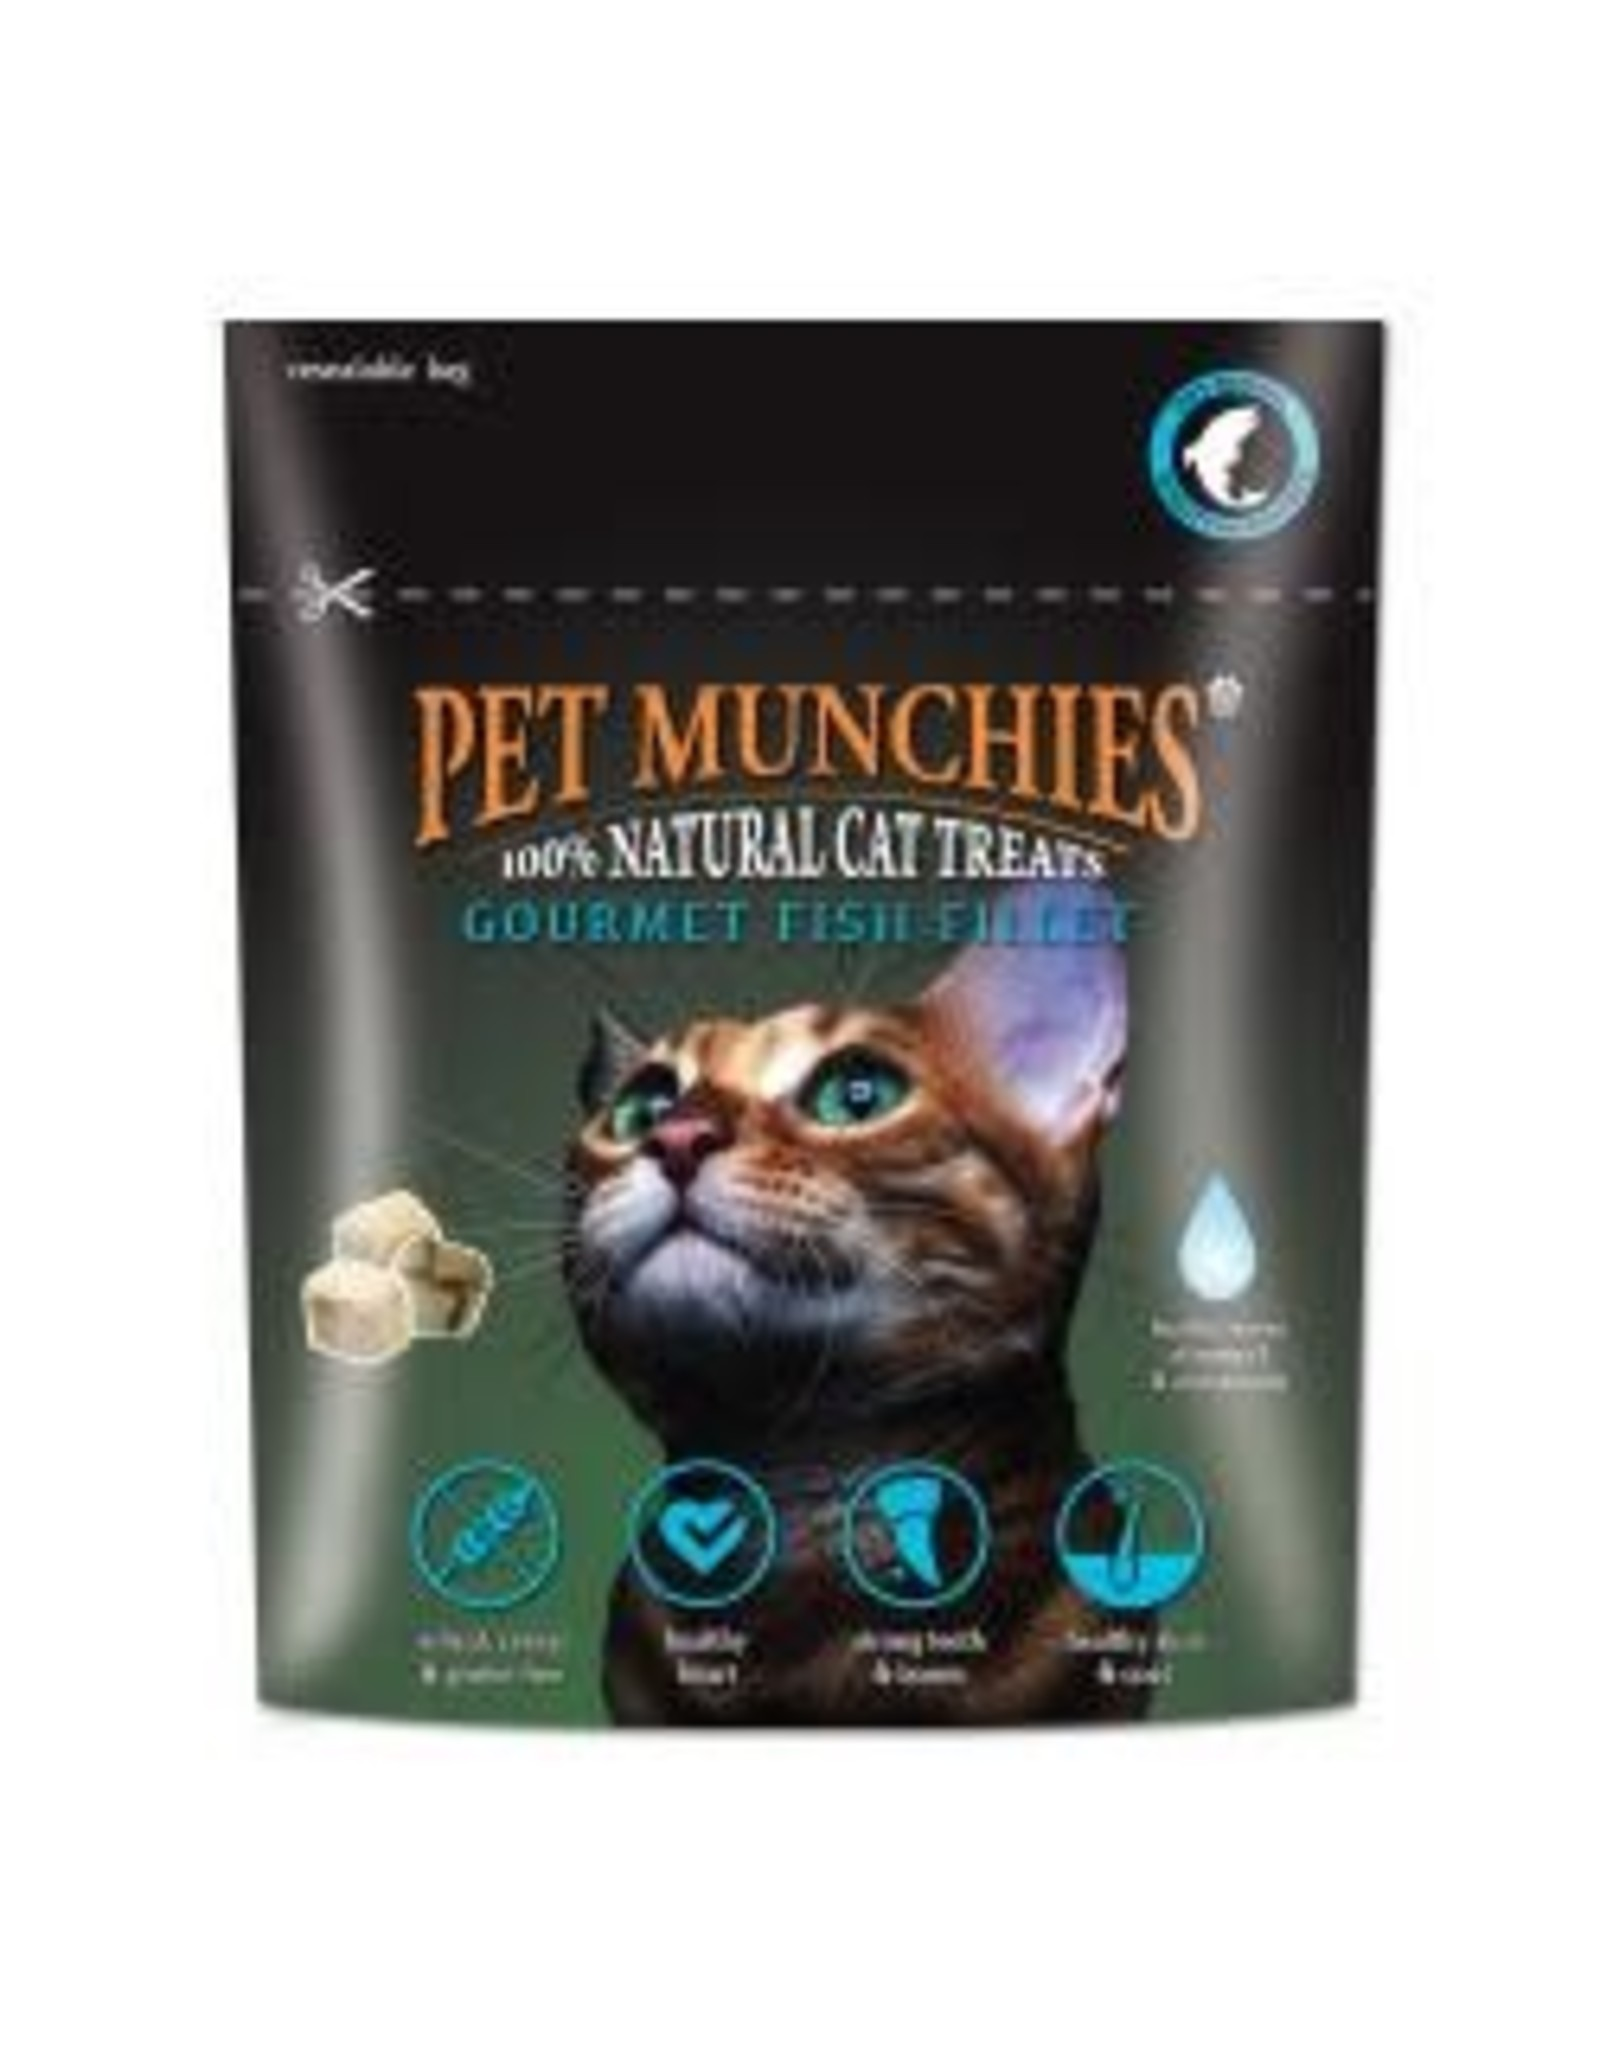 Pet Munchies Pet Munchies Cat Fish Fillet